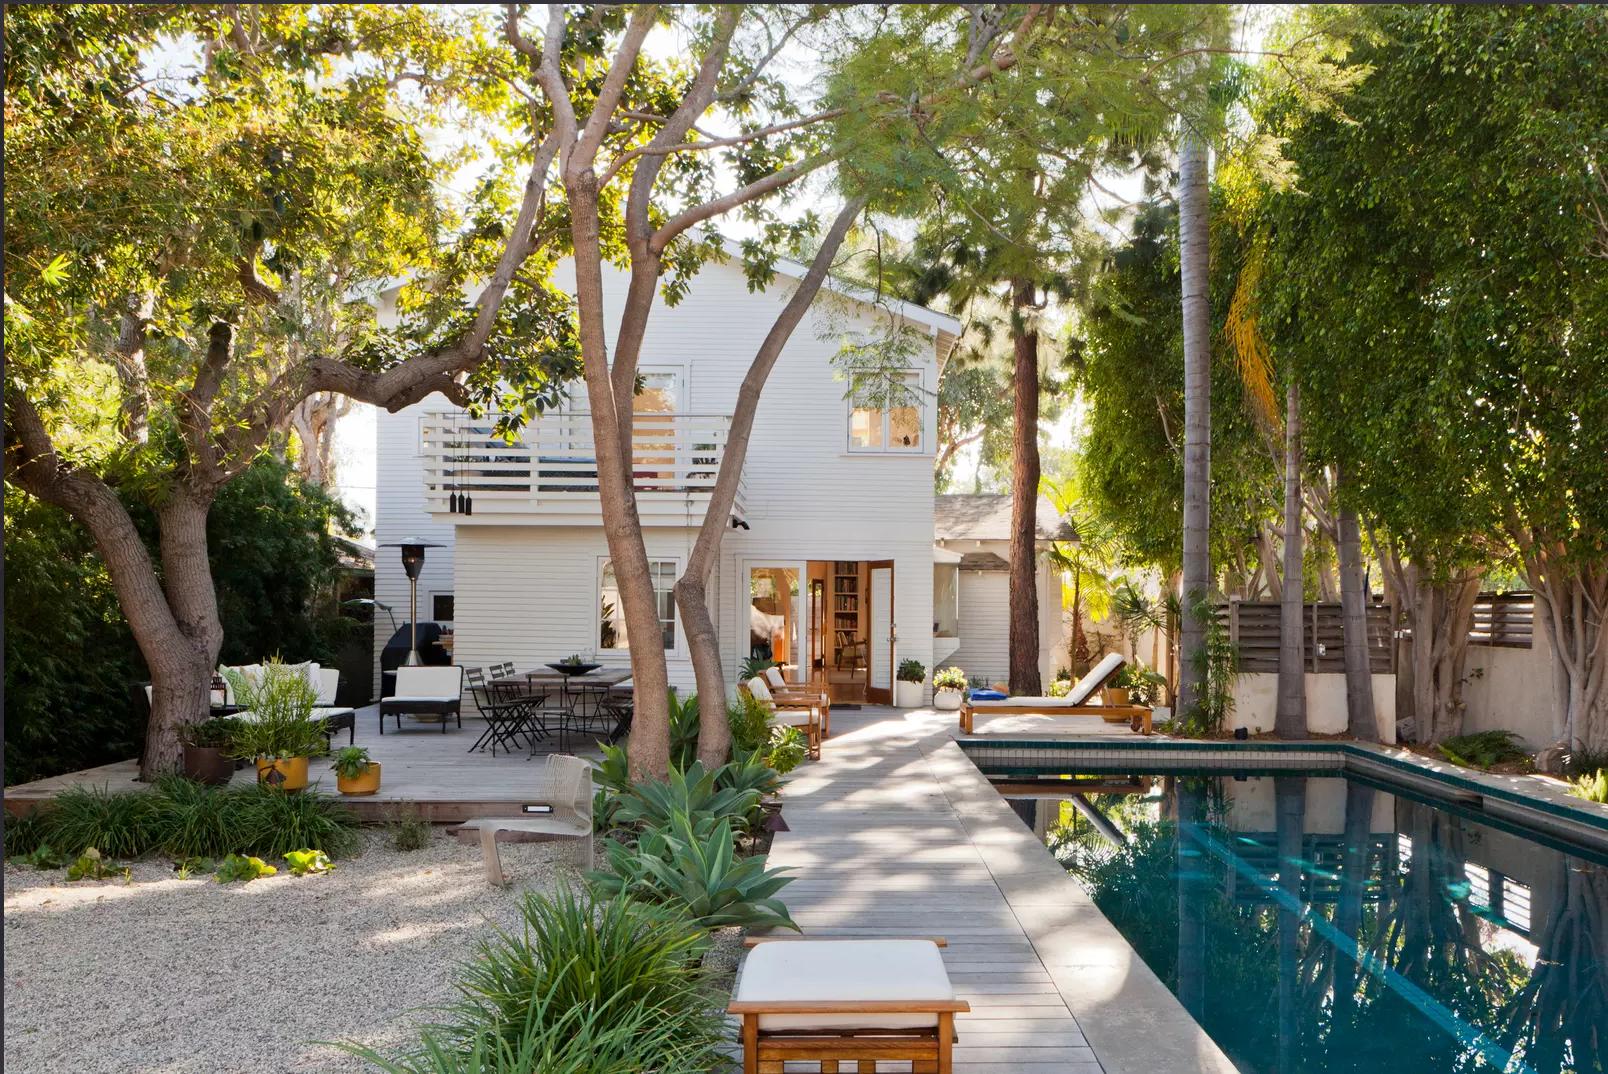 Marine Street: A beachside home in Santa Monica, Los Angeles